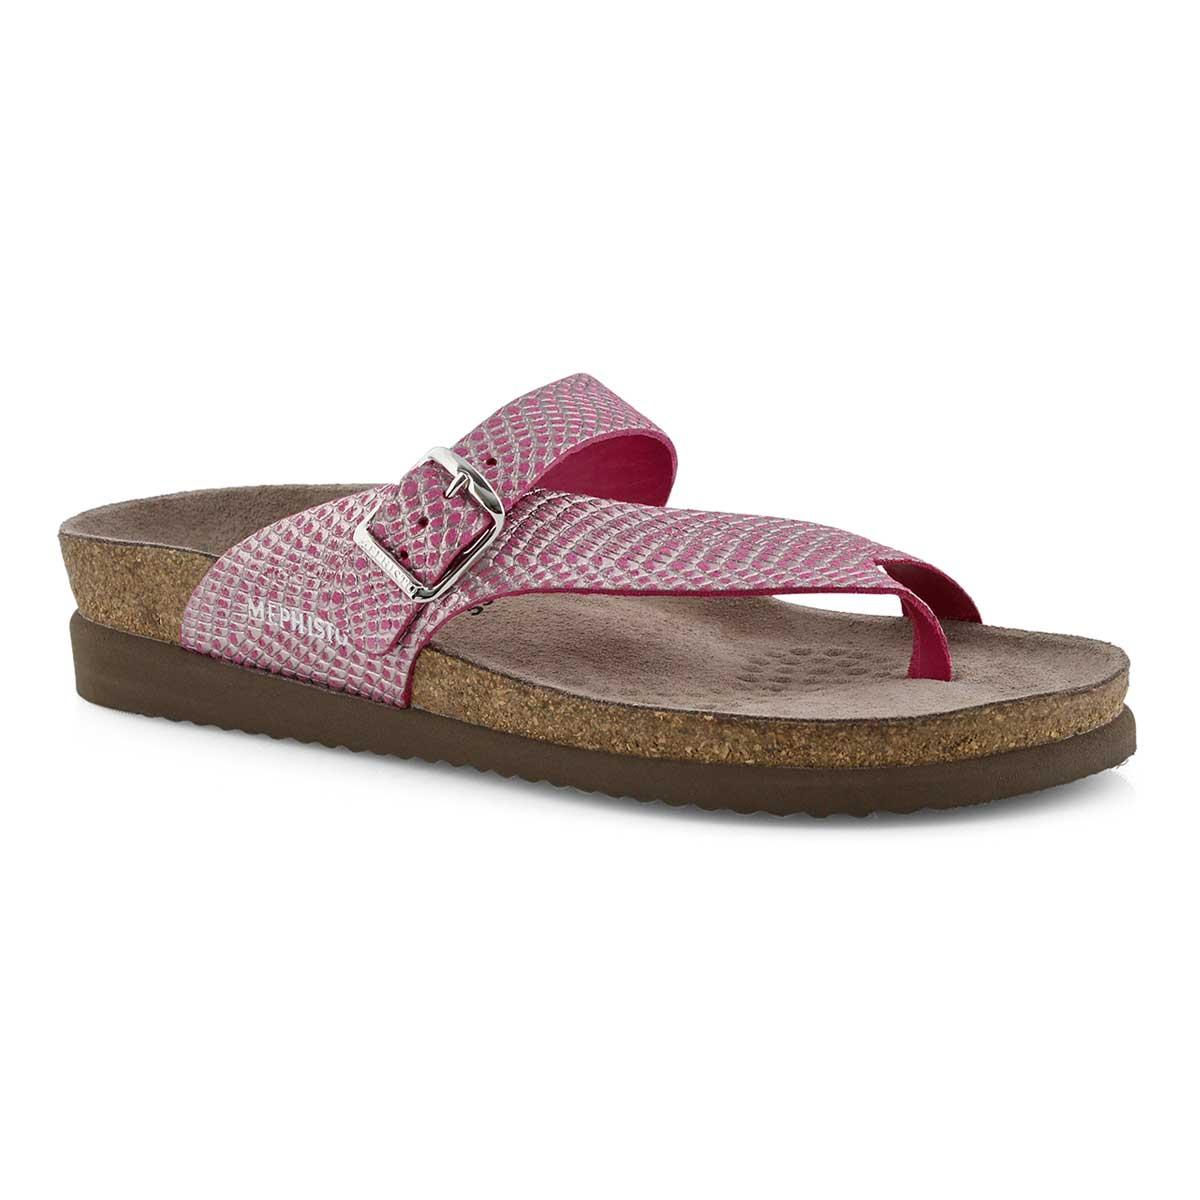 4246c32f4d Mephisto Women's HELEN pink cuba footbed thon   Softmoc.com